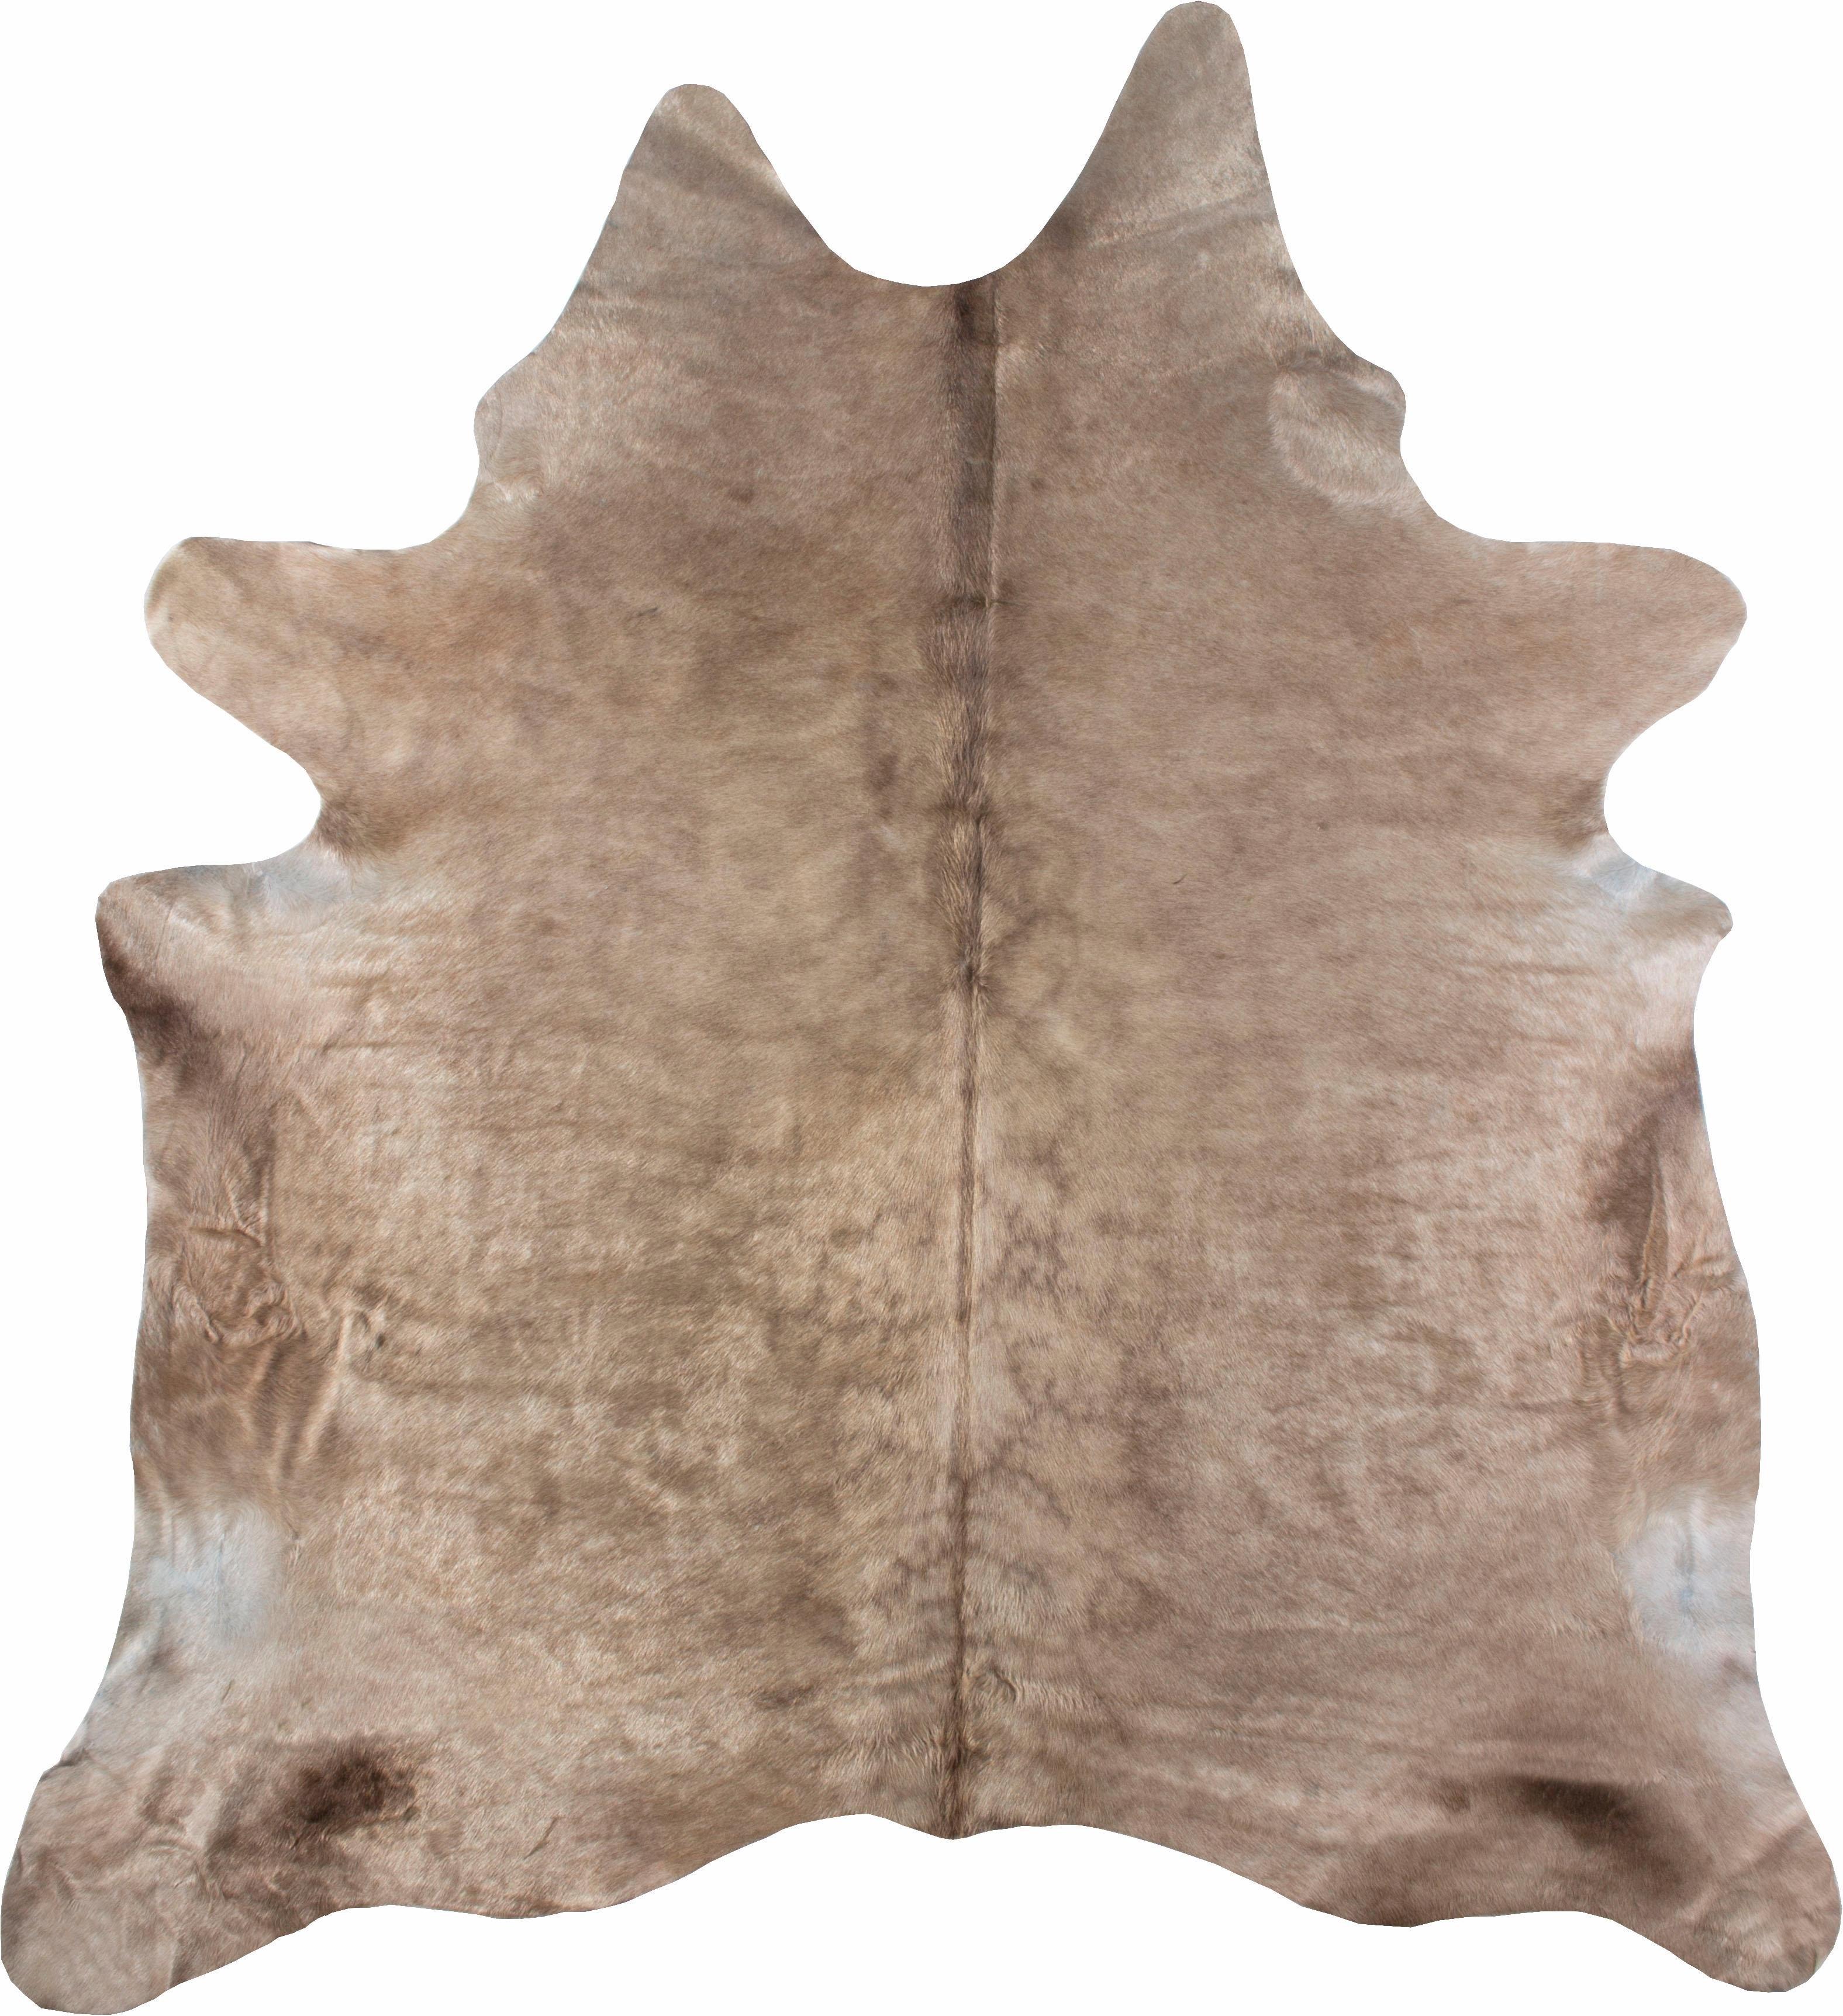 vacht vloerkleed luxor living koeienvacht 3 echte runderhuid snel gevonden otto. Black Bedroom Furniture Sets. Home Design Ideas